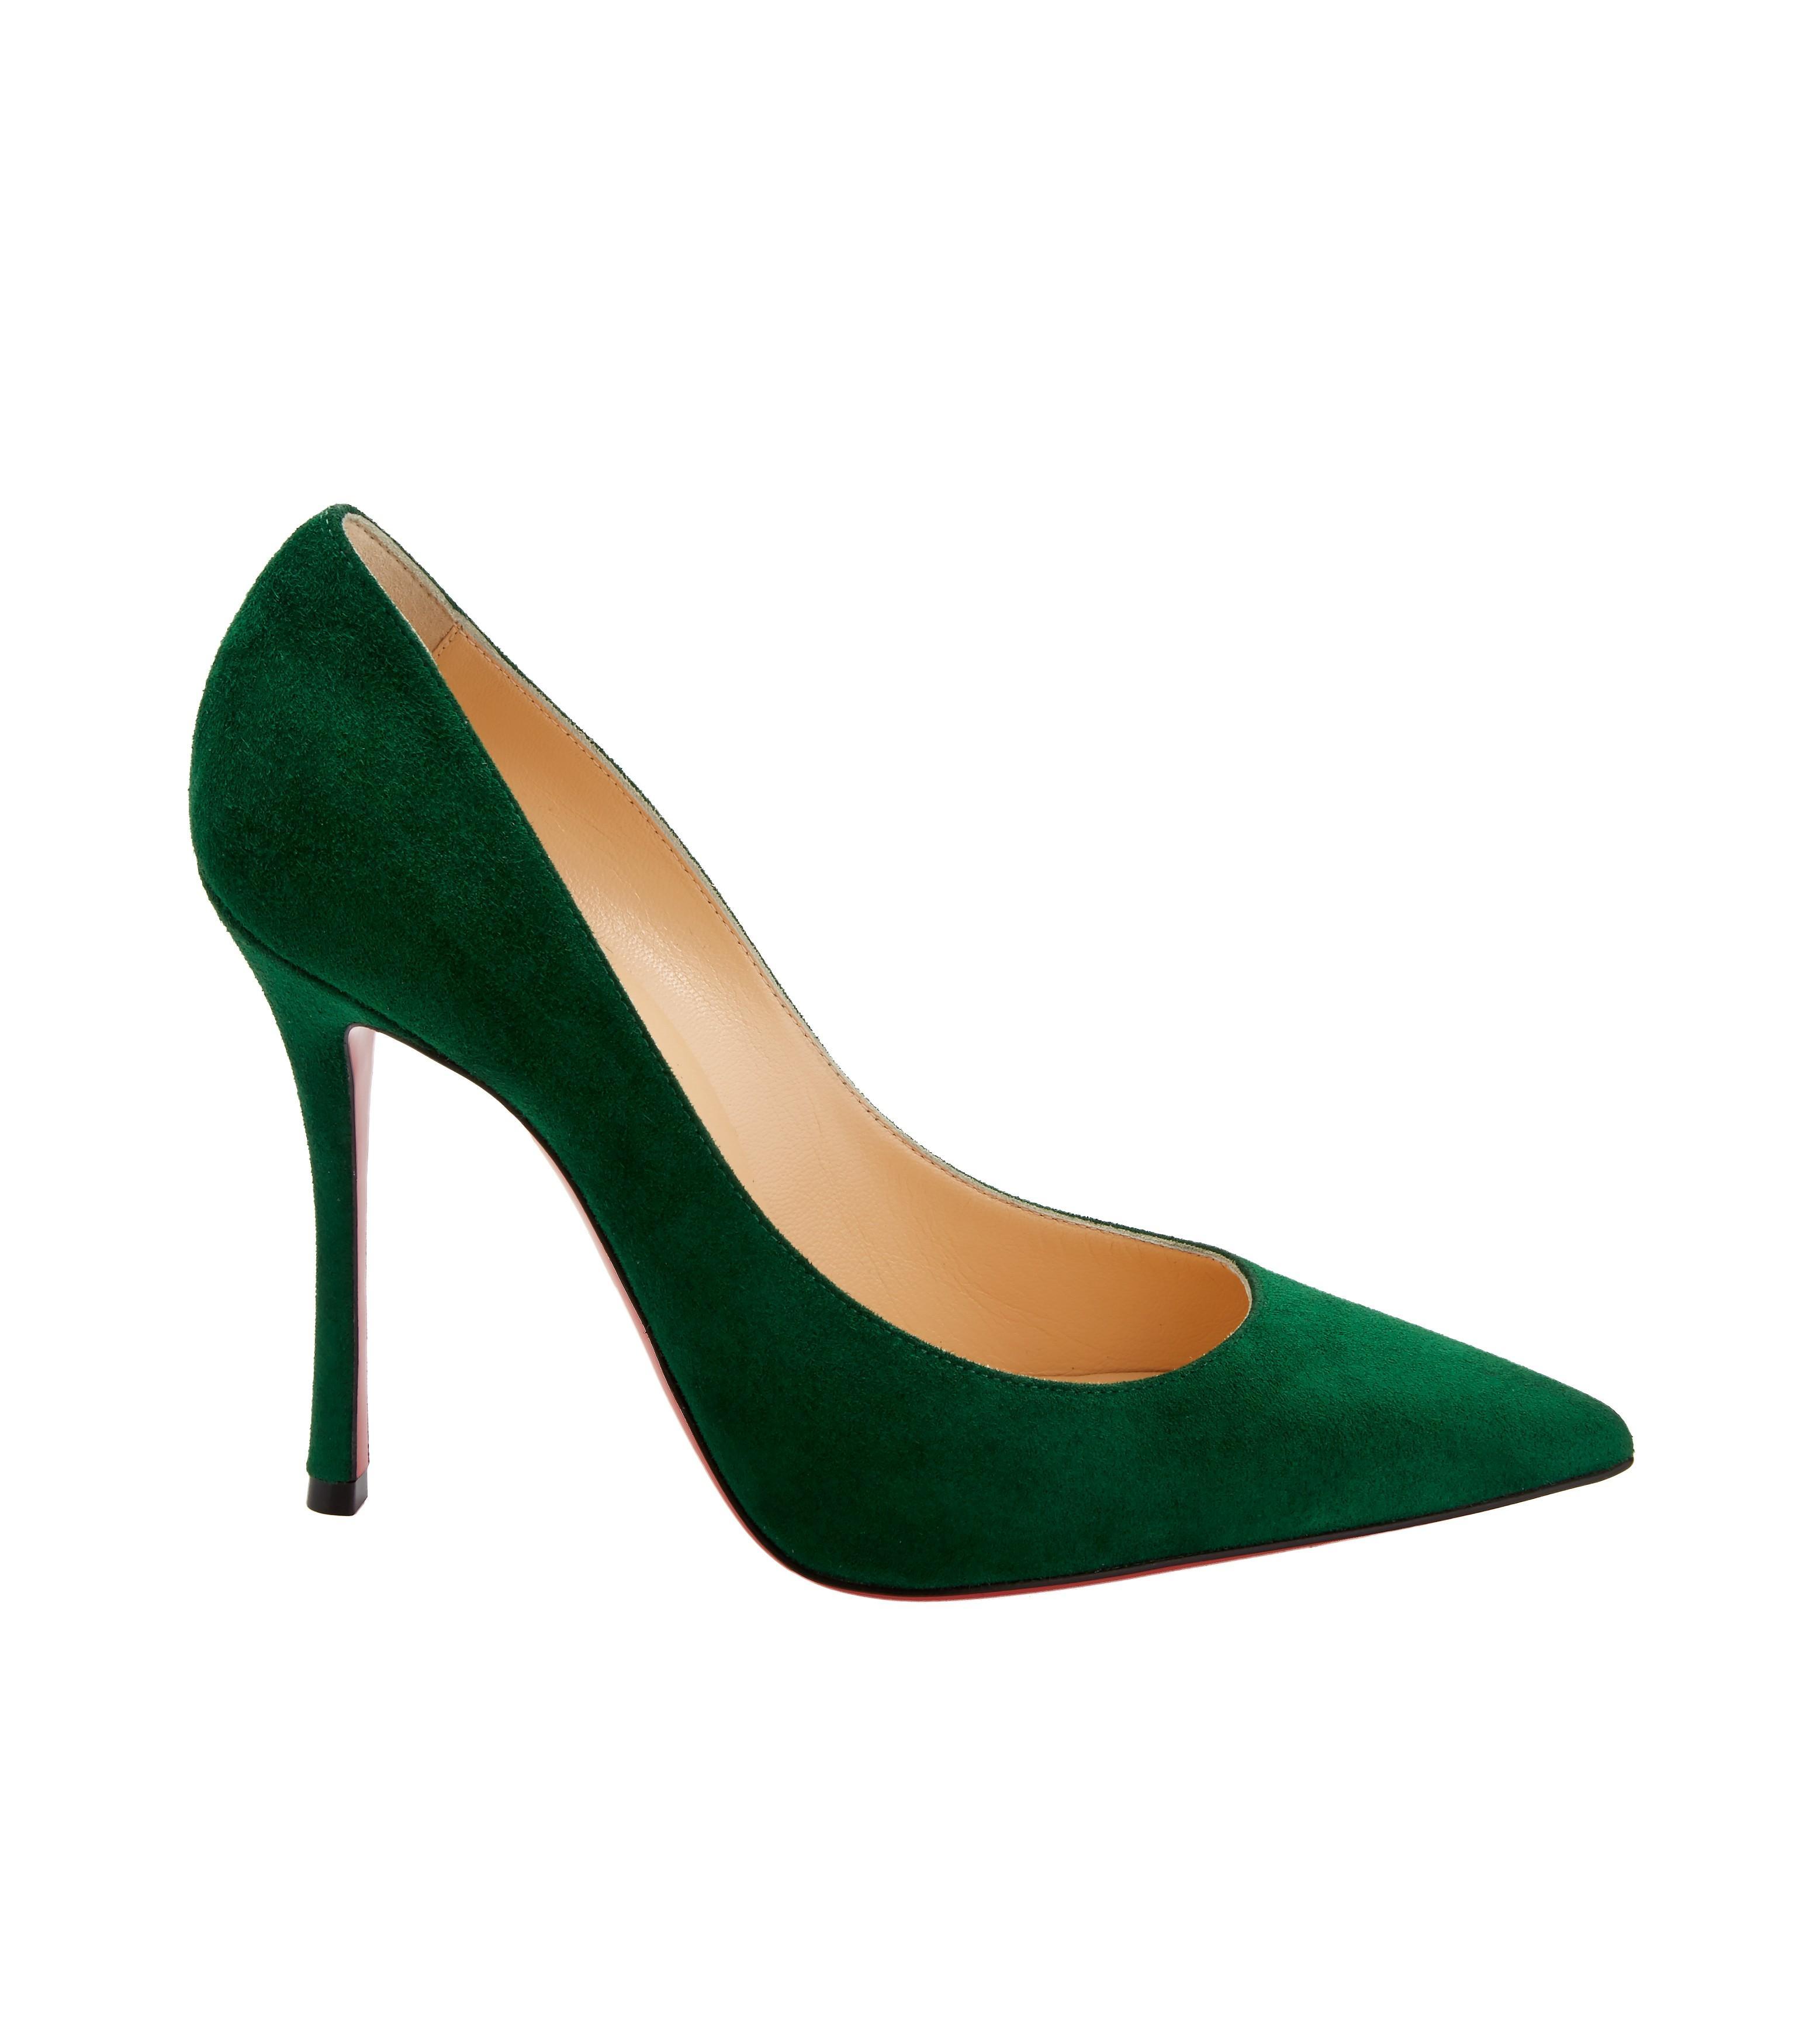 quality design e6ed6 b7ac5 Women's Decoltish Jungle Green Suede Pumps